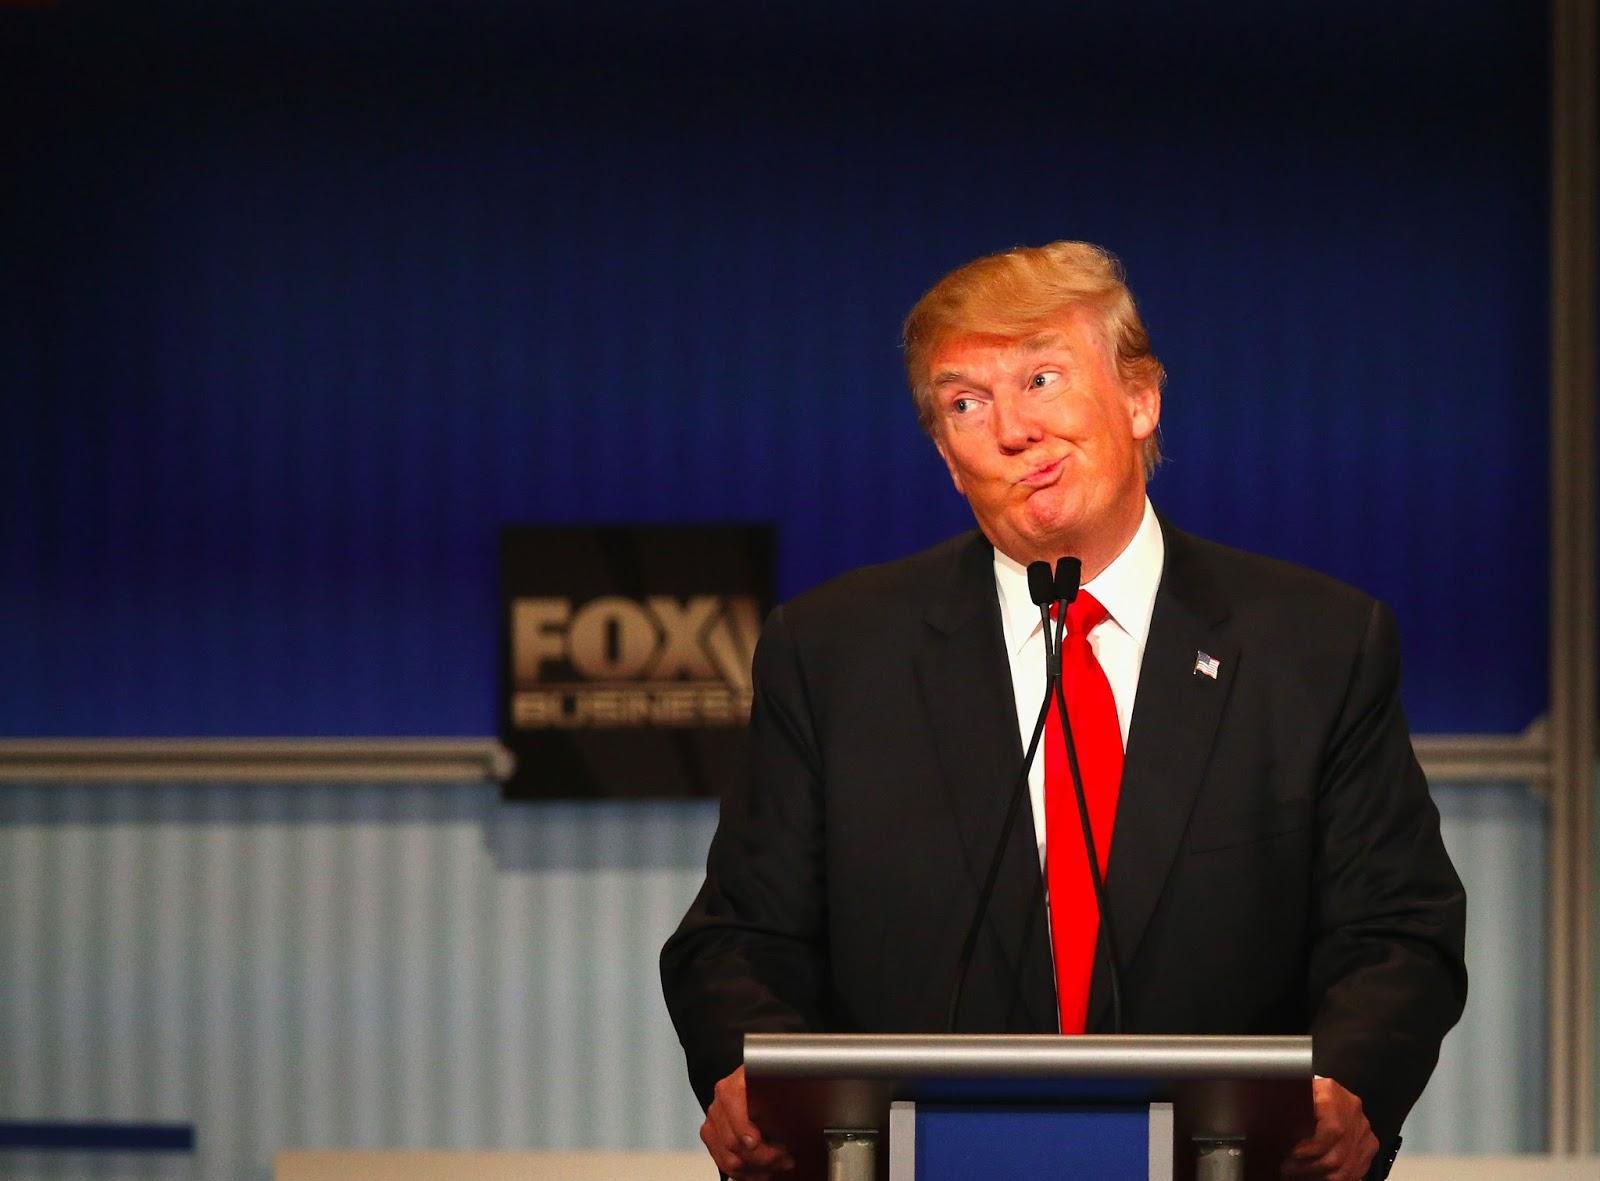 Gonzo Notes 01  Das Leben unter dem Befehl des Präsidenten Trump ... 78581d0e54d1